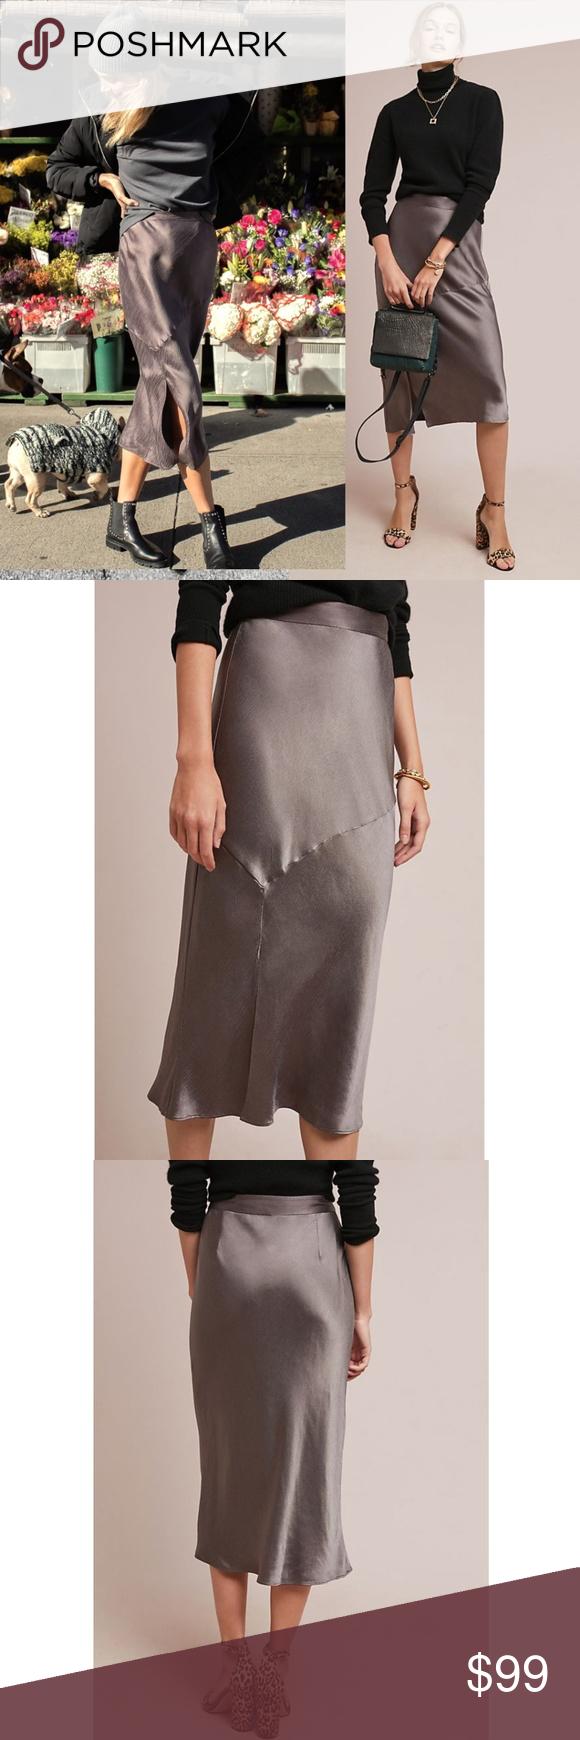 da4a45c42991c NWT ANTHROPOLOGIE Hutch Bias Satin Skirt Brand new with tags NWT  ANTHROPOLOGIE Hutch Bias Satin Skirt